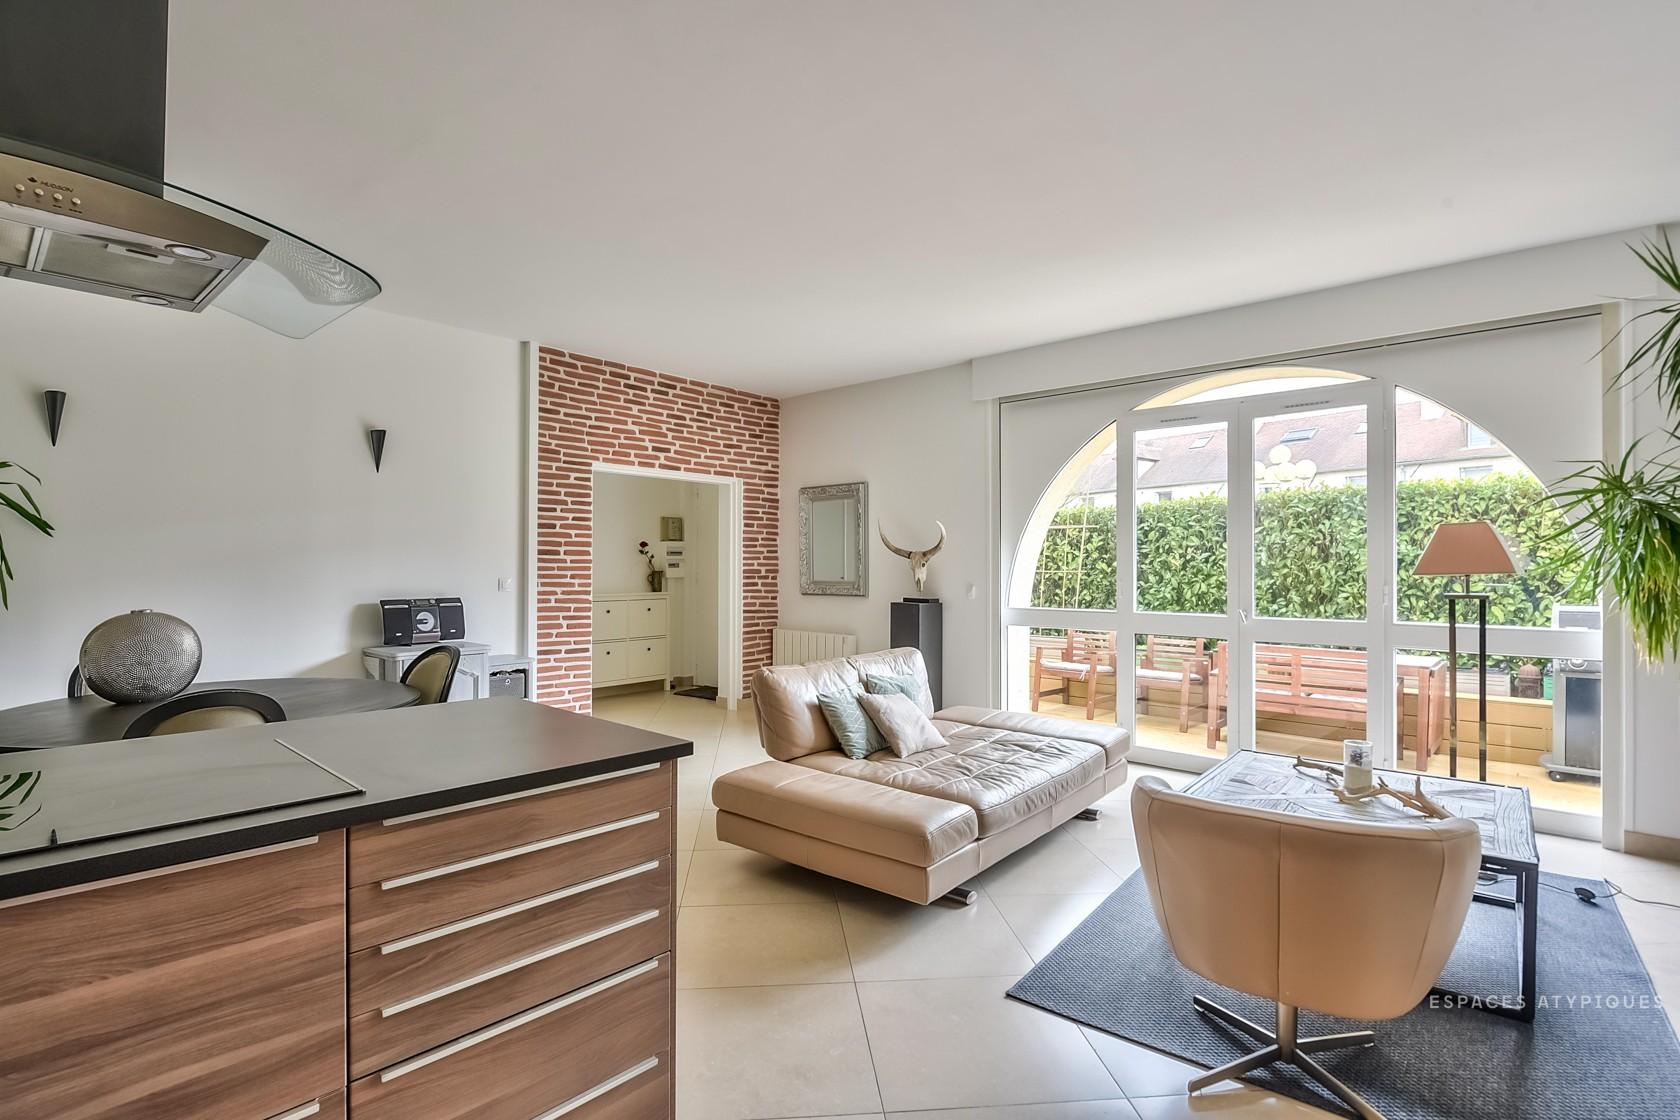 Location appartement terrasse yvelines